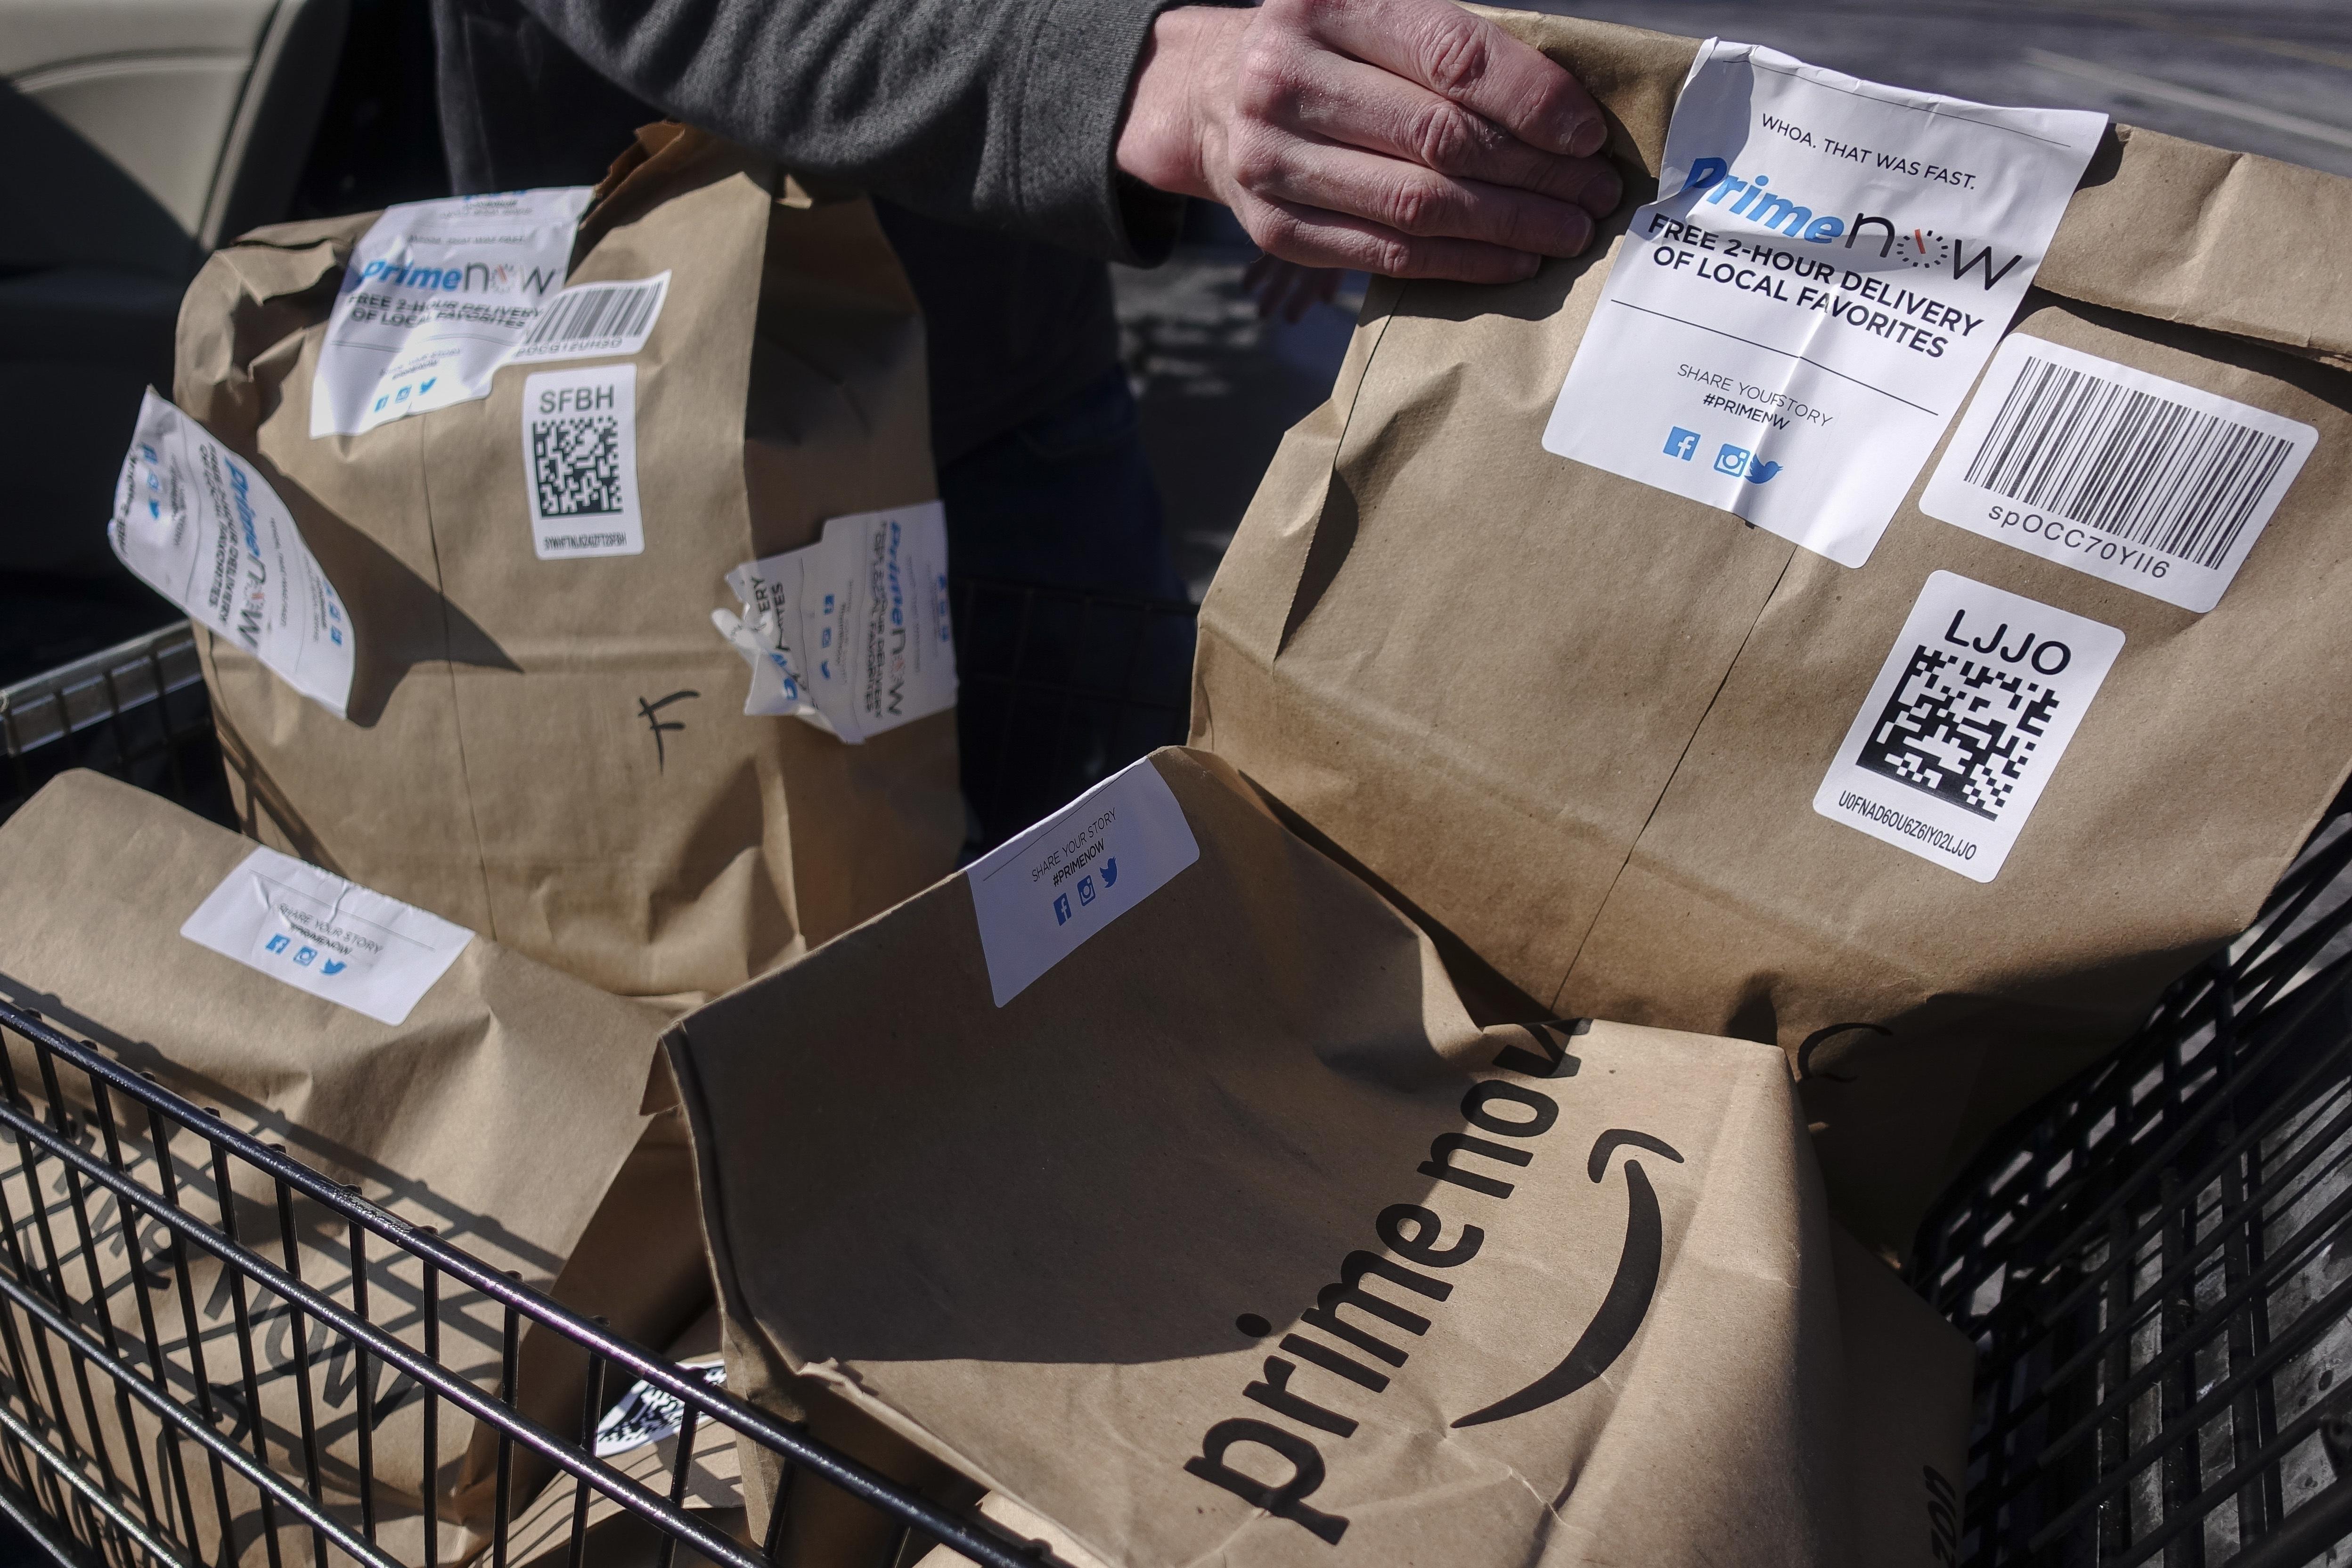 Amazon selling expired foods; consumer advocacy groups blame marketpla